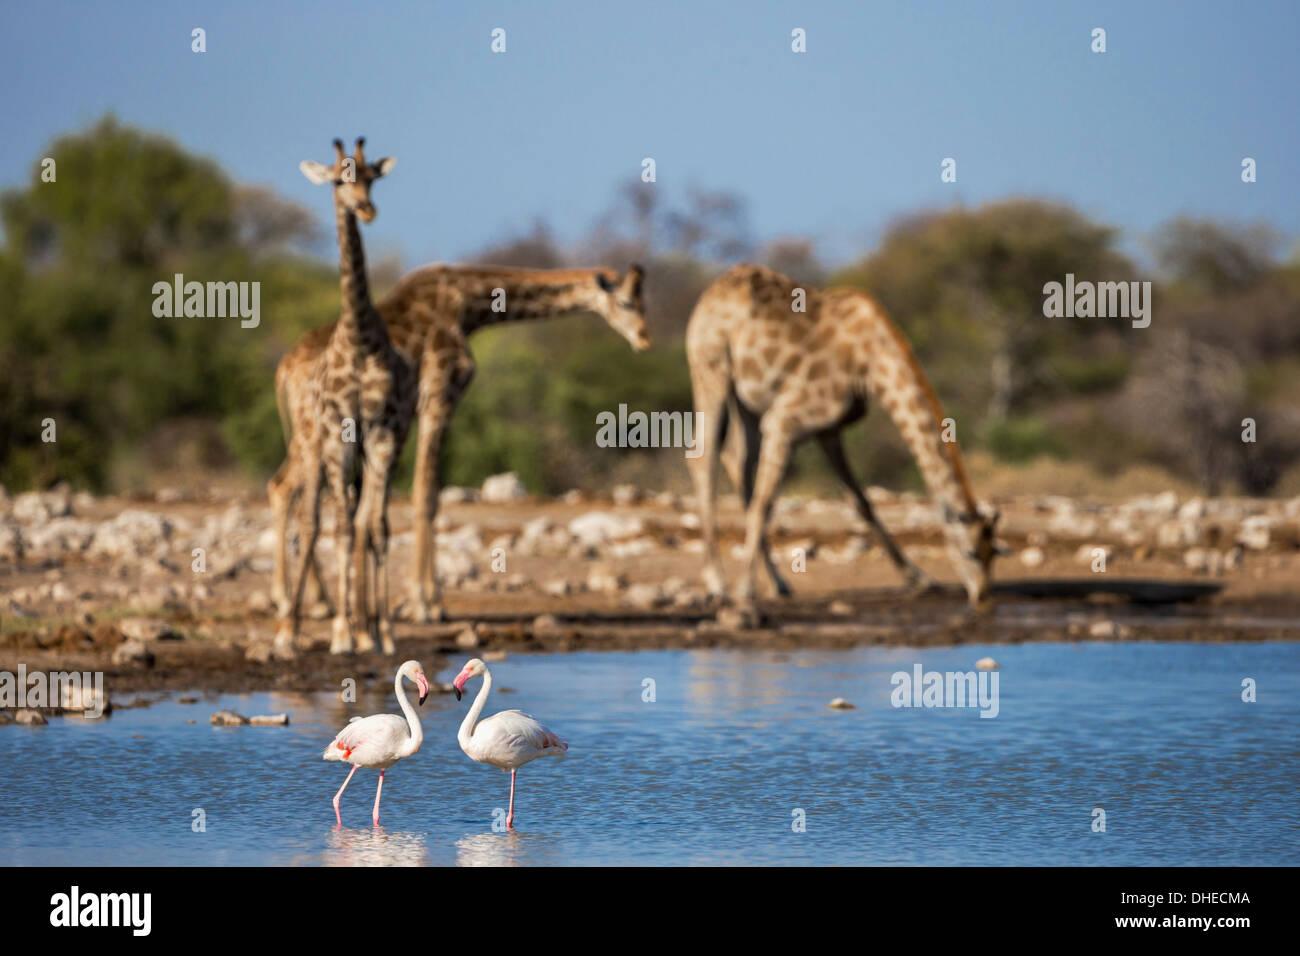 Giraffe (Giraffa camelopardalis) ,  greater flamingoes (Phoenicopterus ruber), Etosha National Park, Namibia, Africa - Stock Image